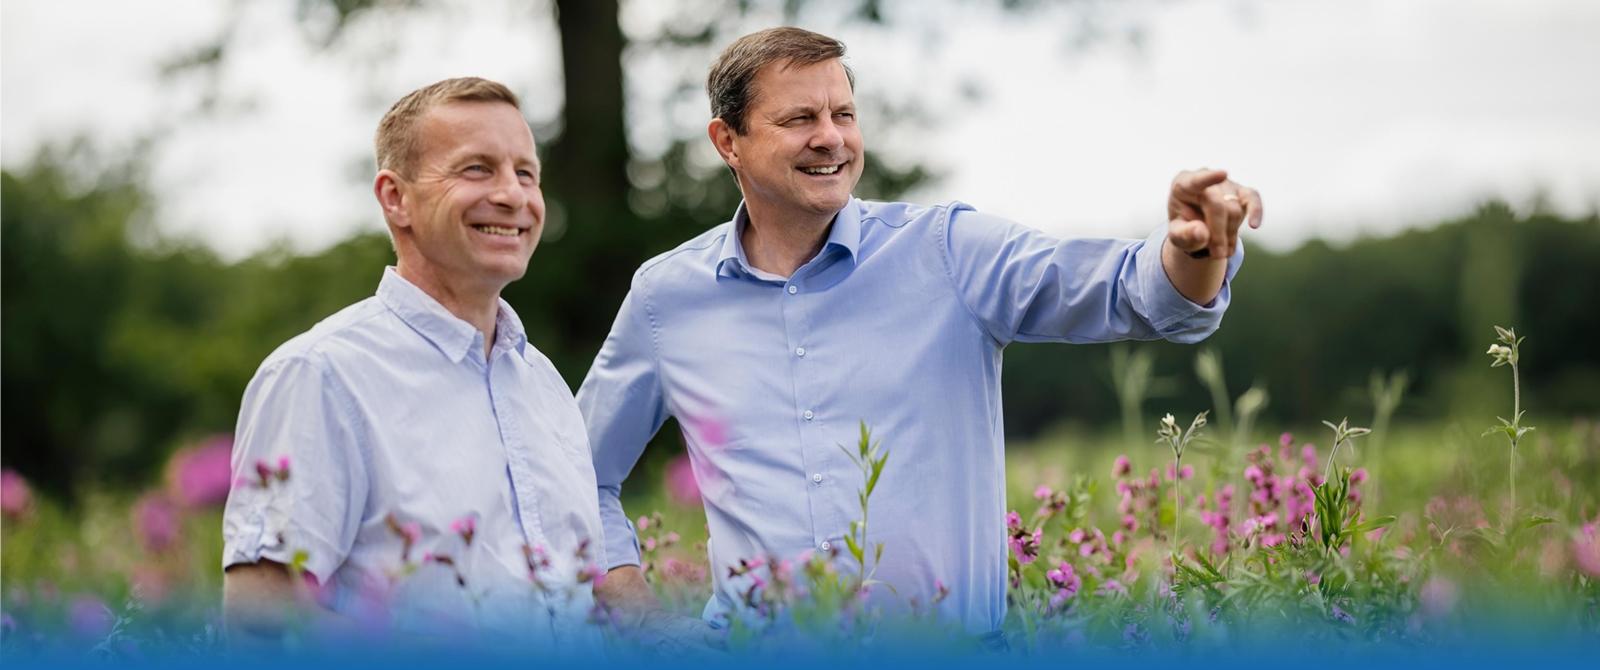 slider-oliver-grundmann-2021-bundestagswahlen-stade-rotenburg-bremervoerde (13)